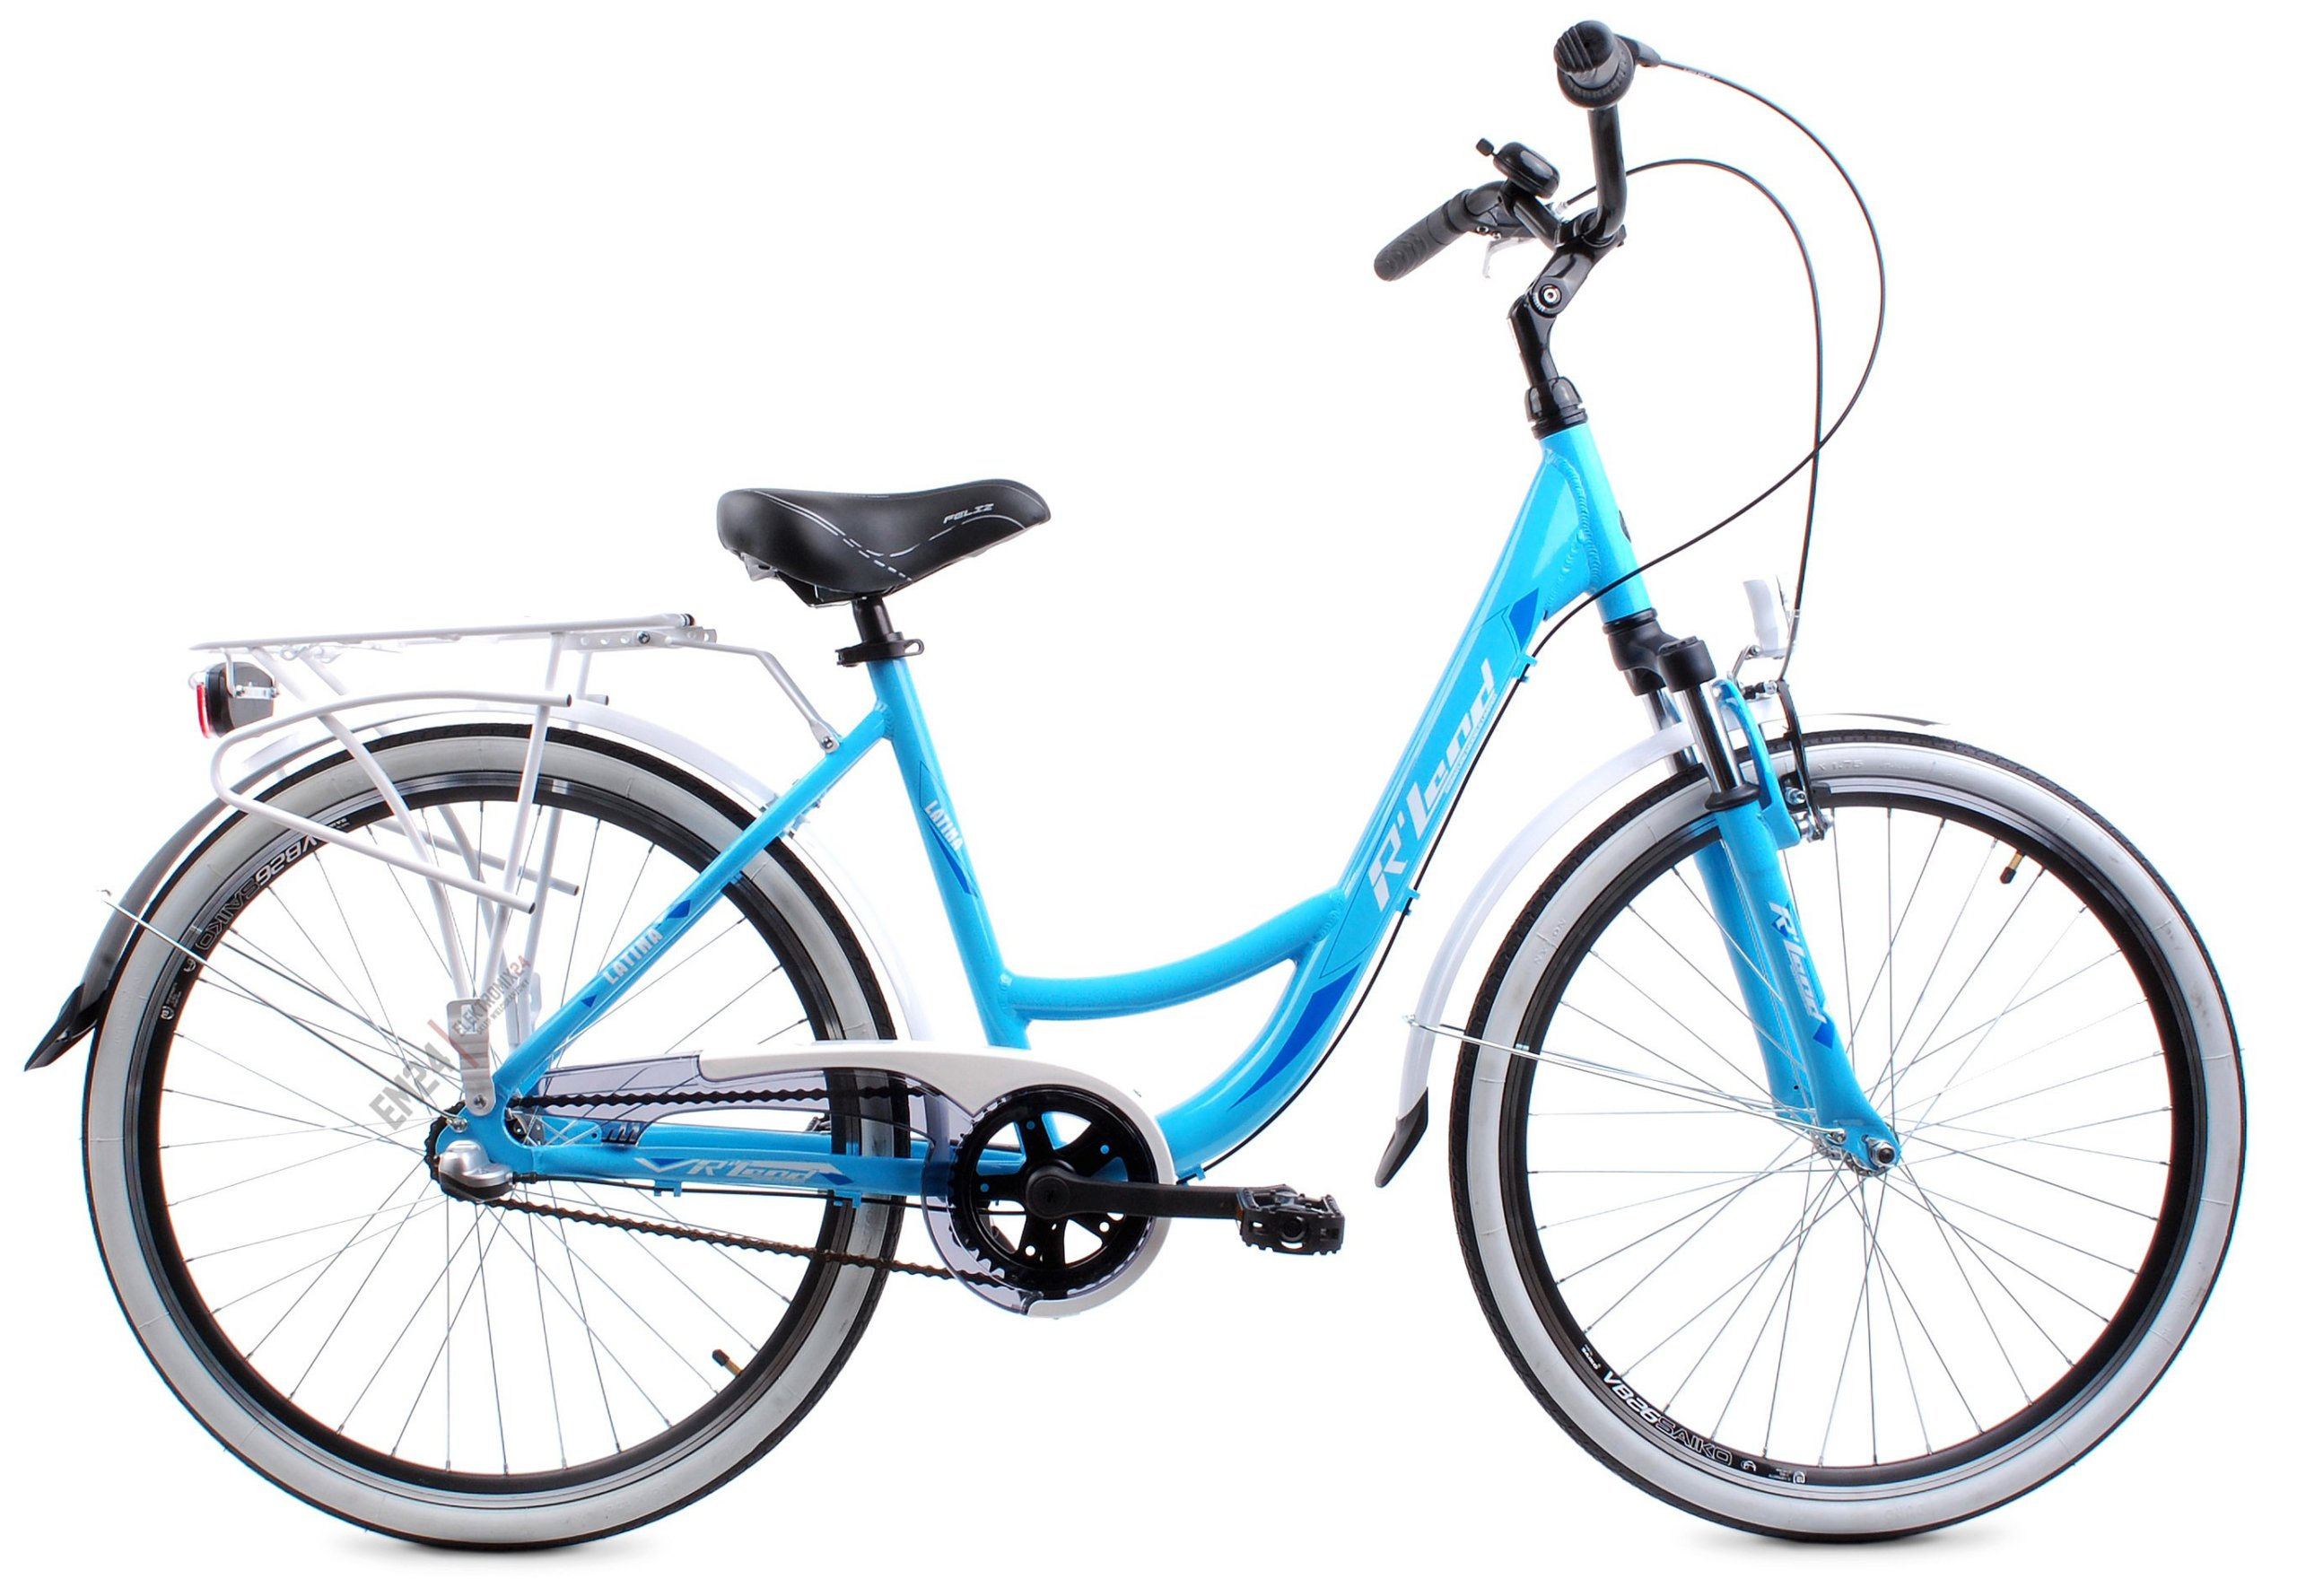 Damski Rower Miejski Rland Latina 26 3v Niebieska 7232167194 Allegro Pl